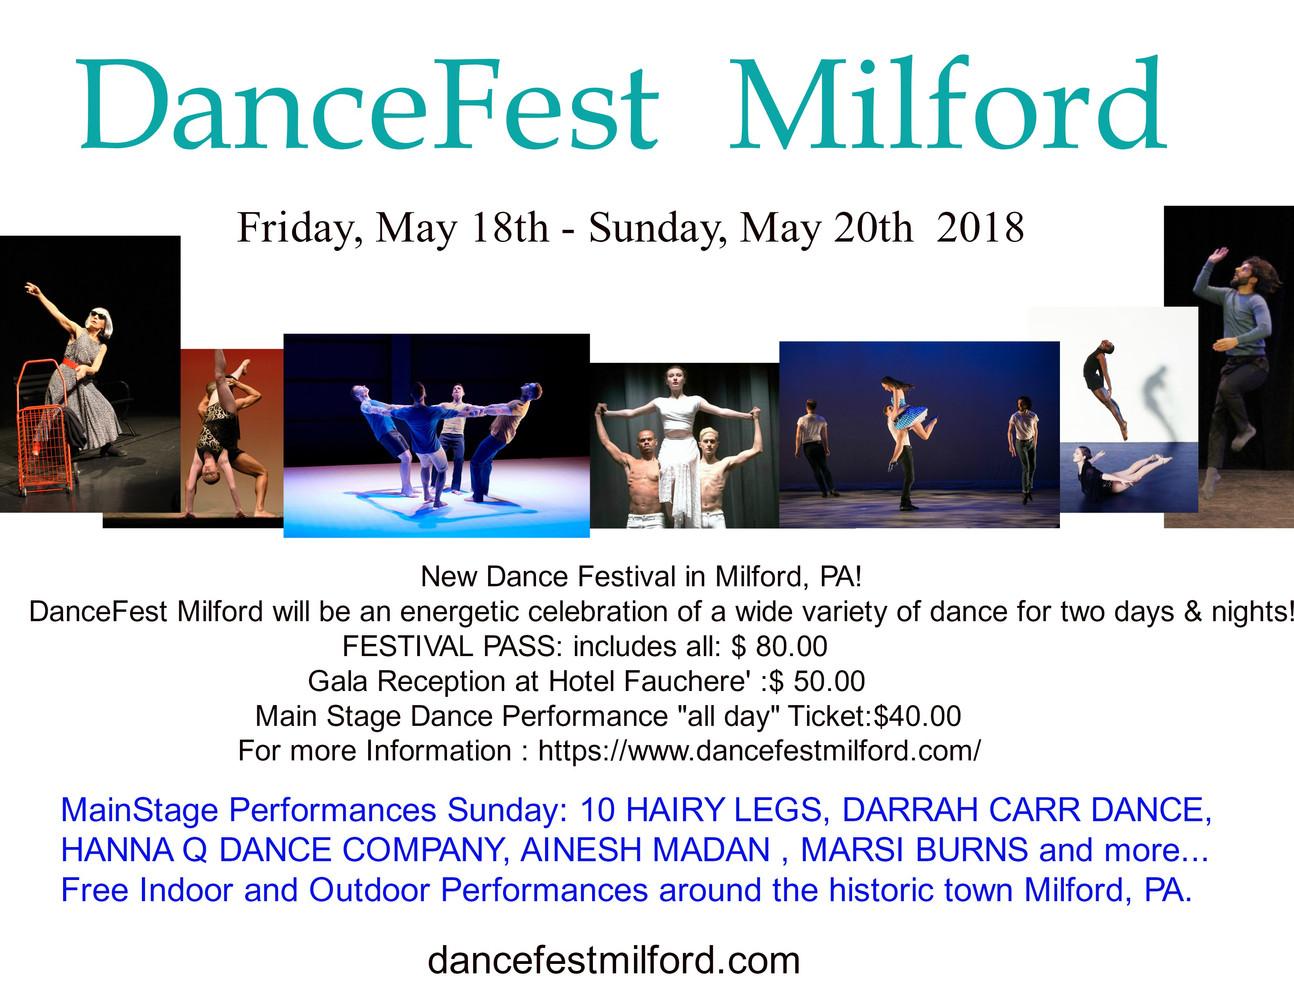 DanceFest Milford 2018